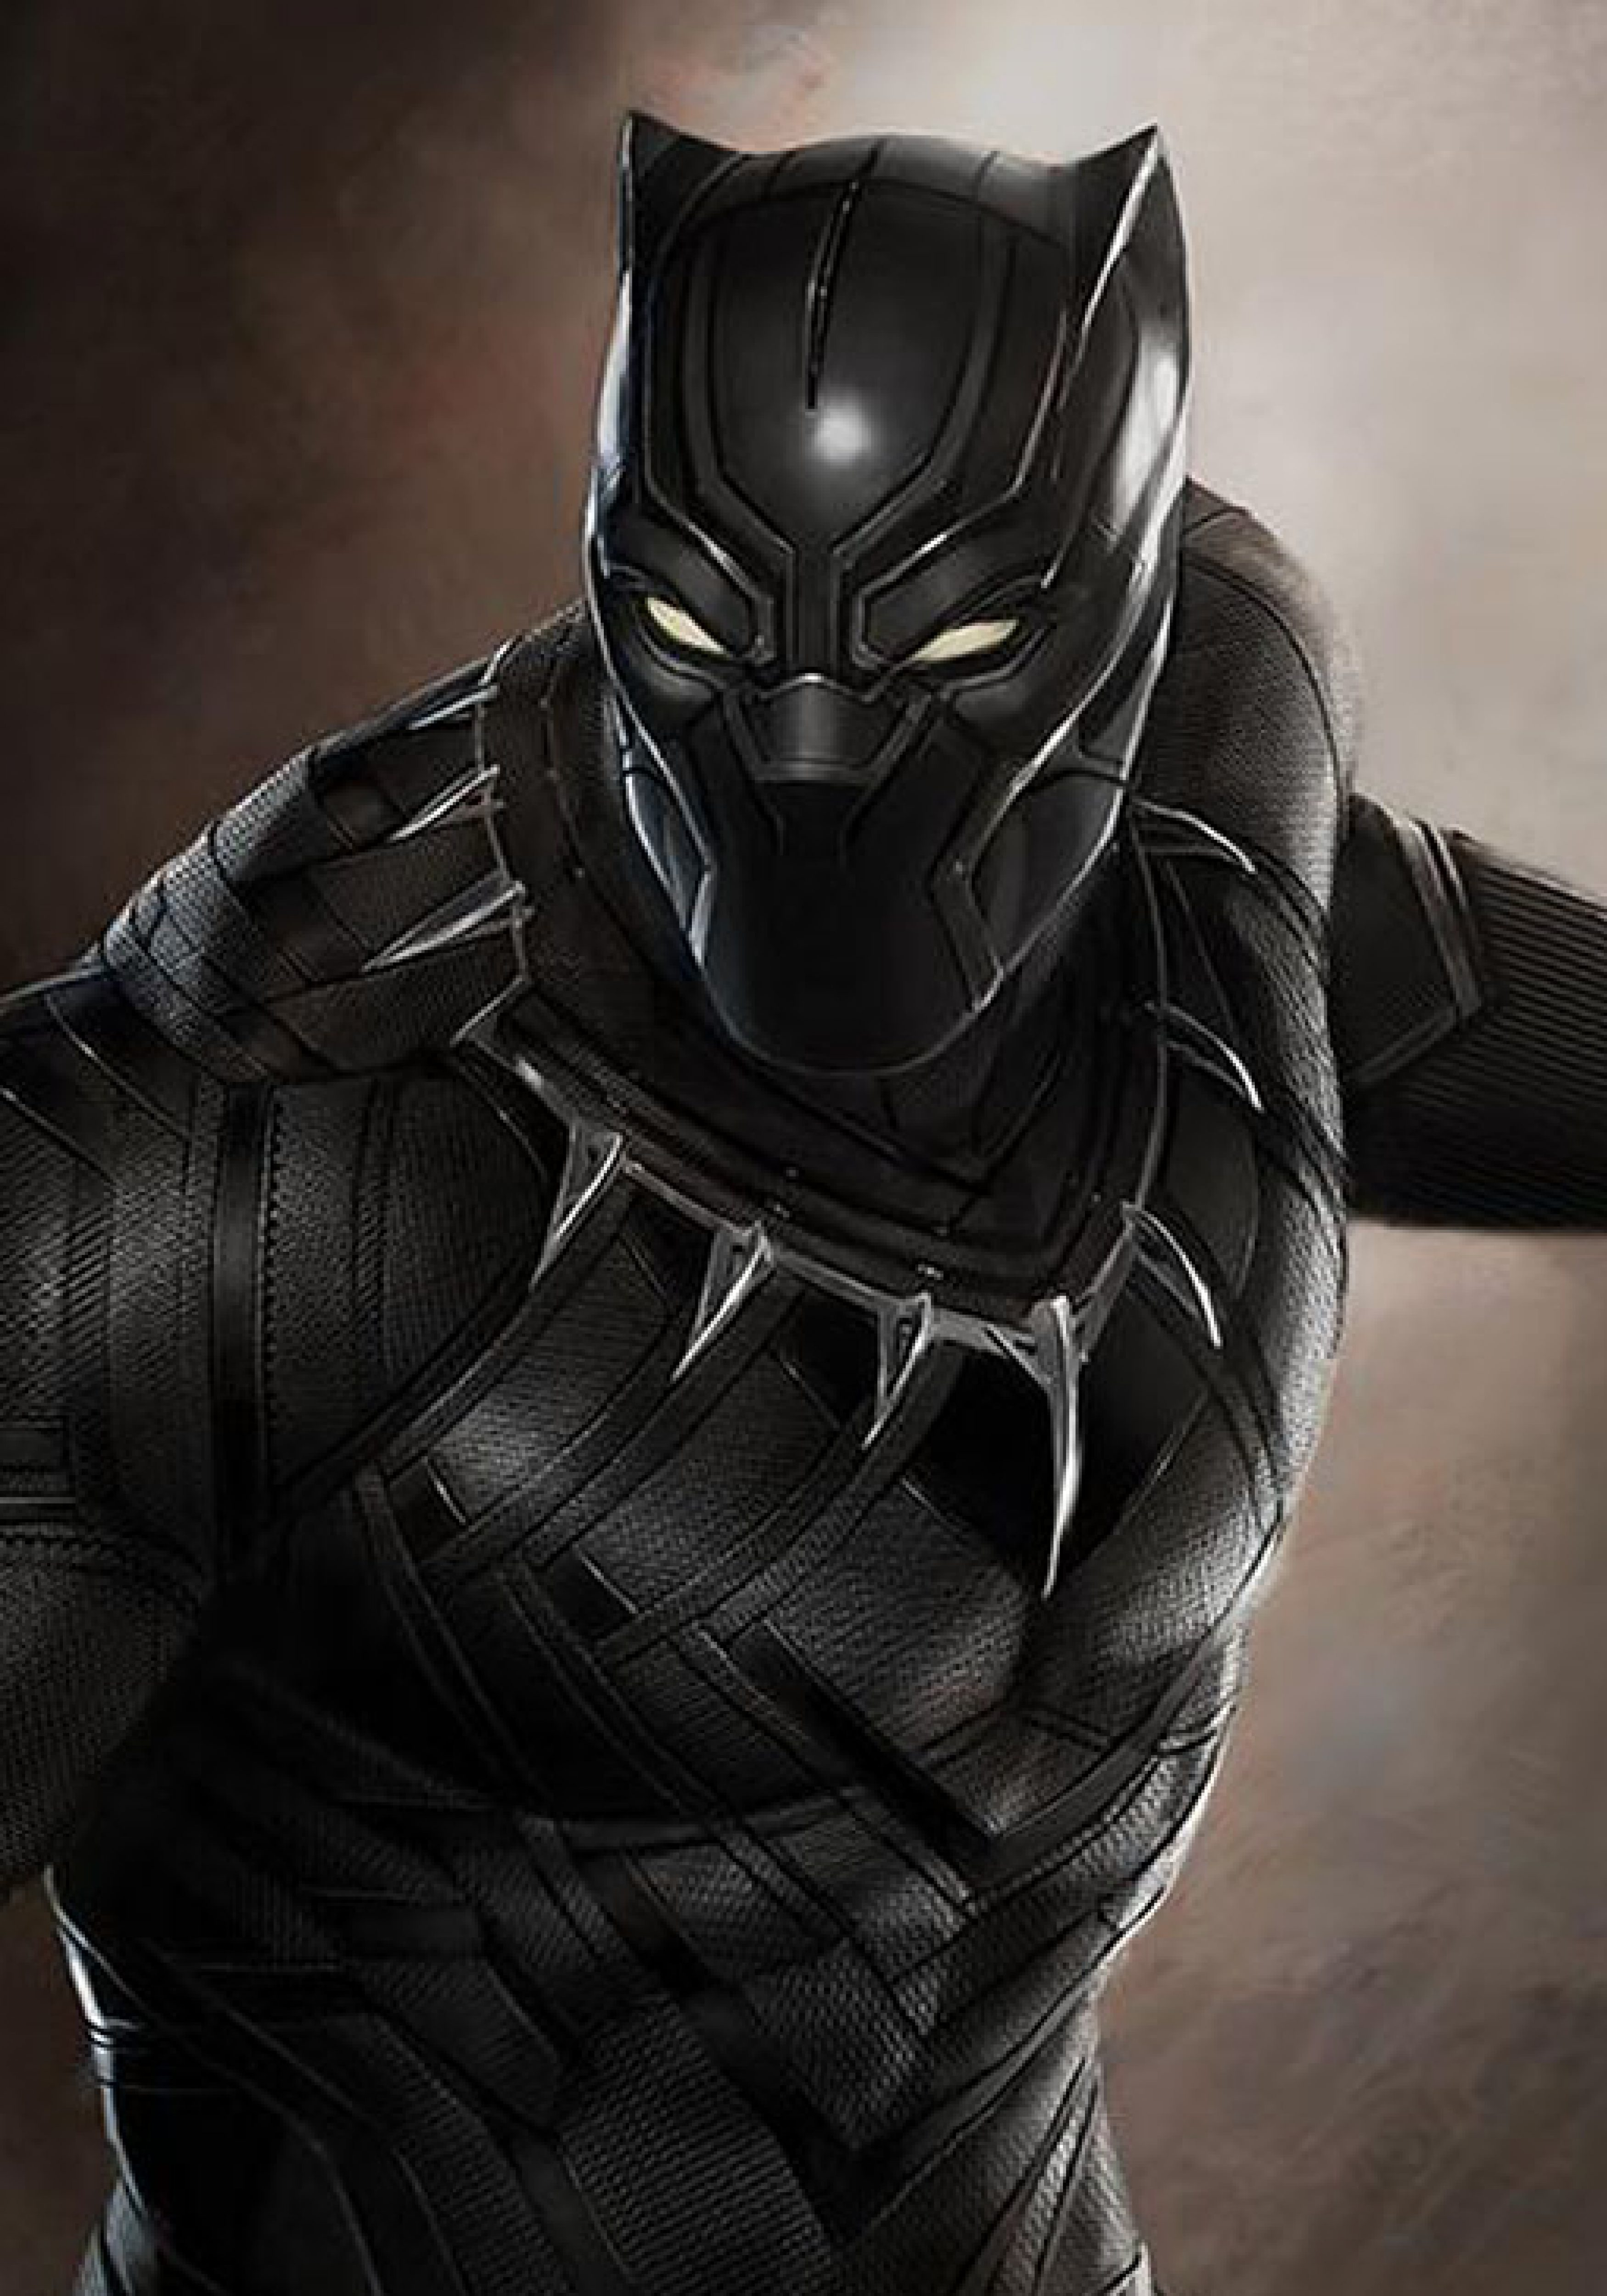 marvel_black_panther_concept_art-3500x5000.jpg